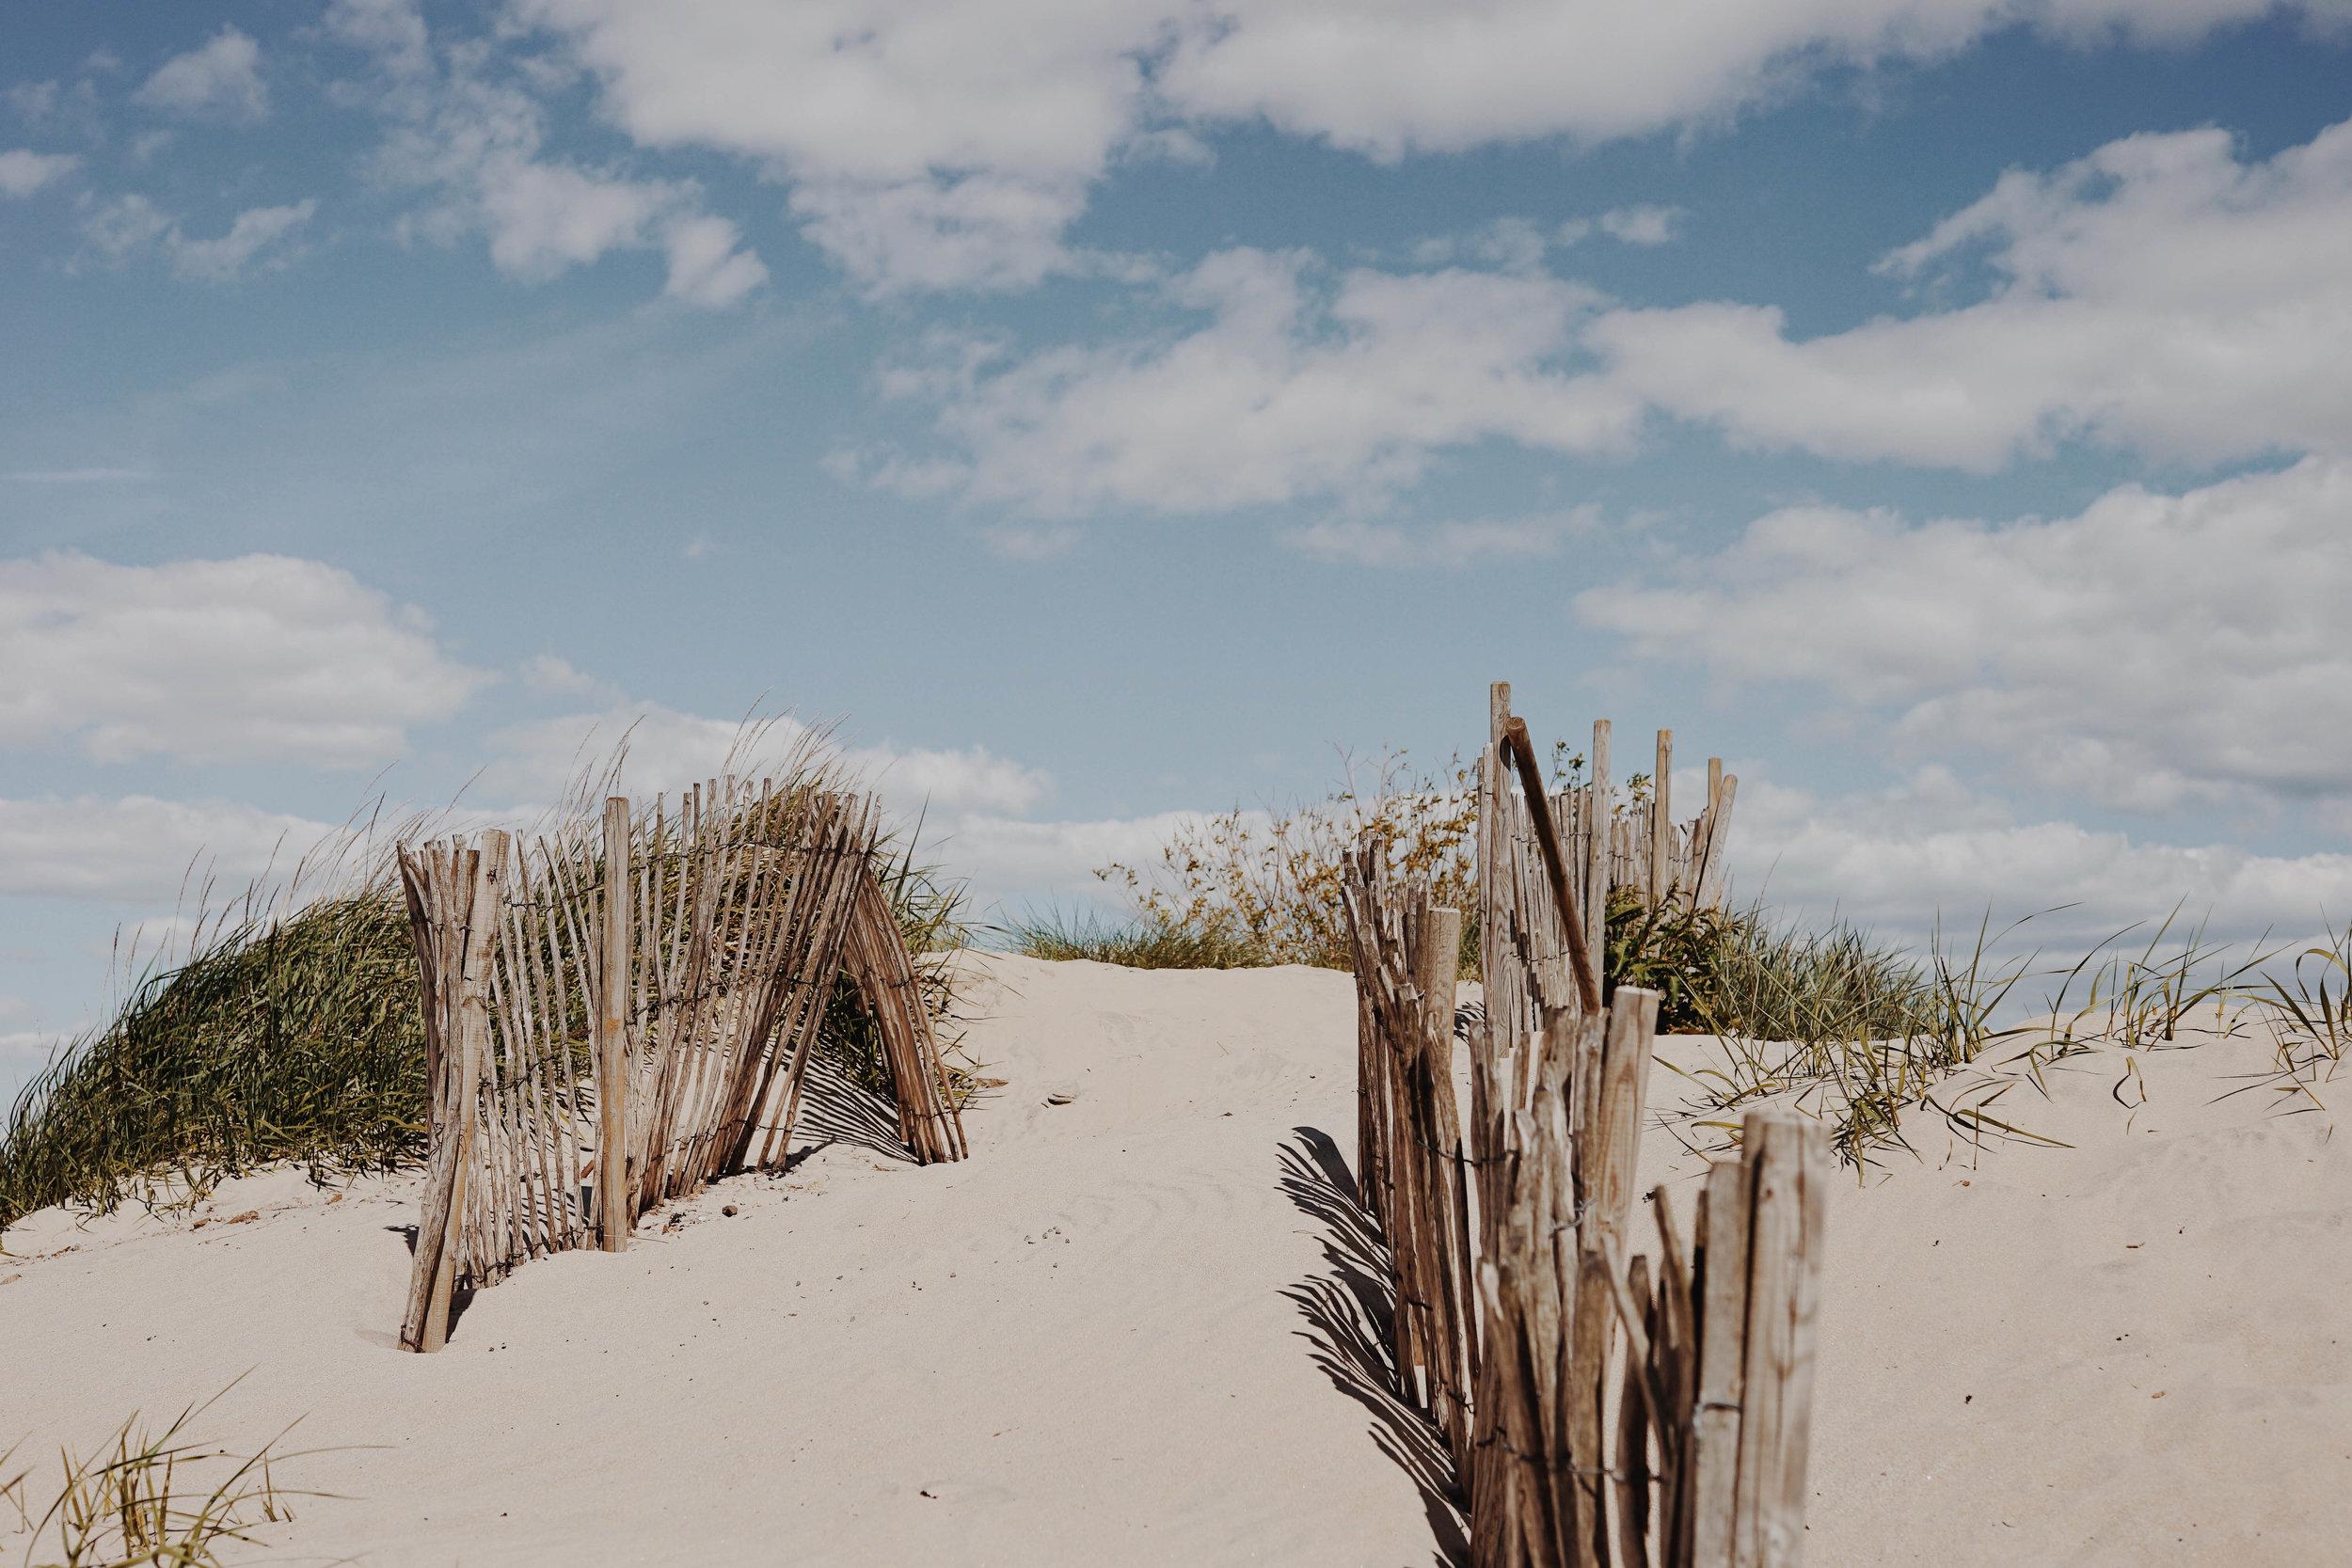 ASROSENVINGE_VisitSkane_Bastad_Beach_LowRes-21.jpg